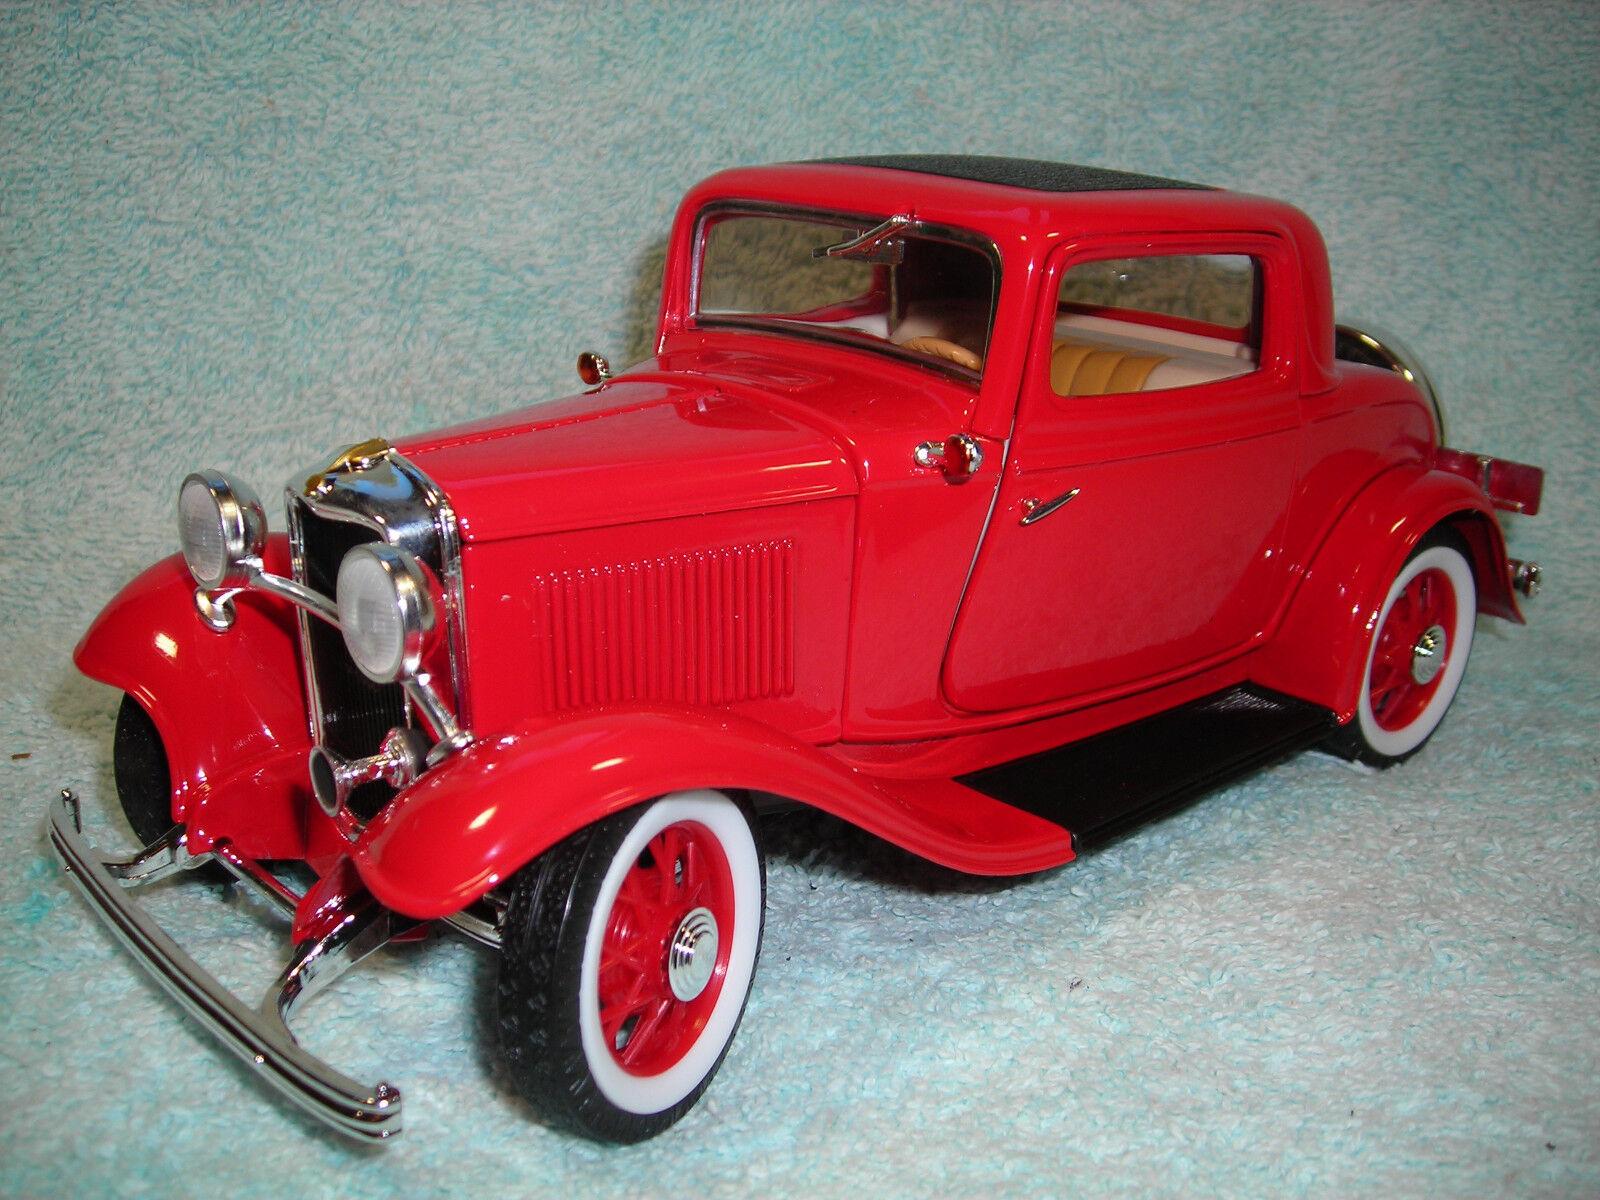 1   18 skala druckguss 1932 ford 3-window coupé in rot über die straße yat-ming legenden.